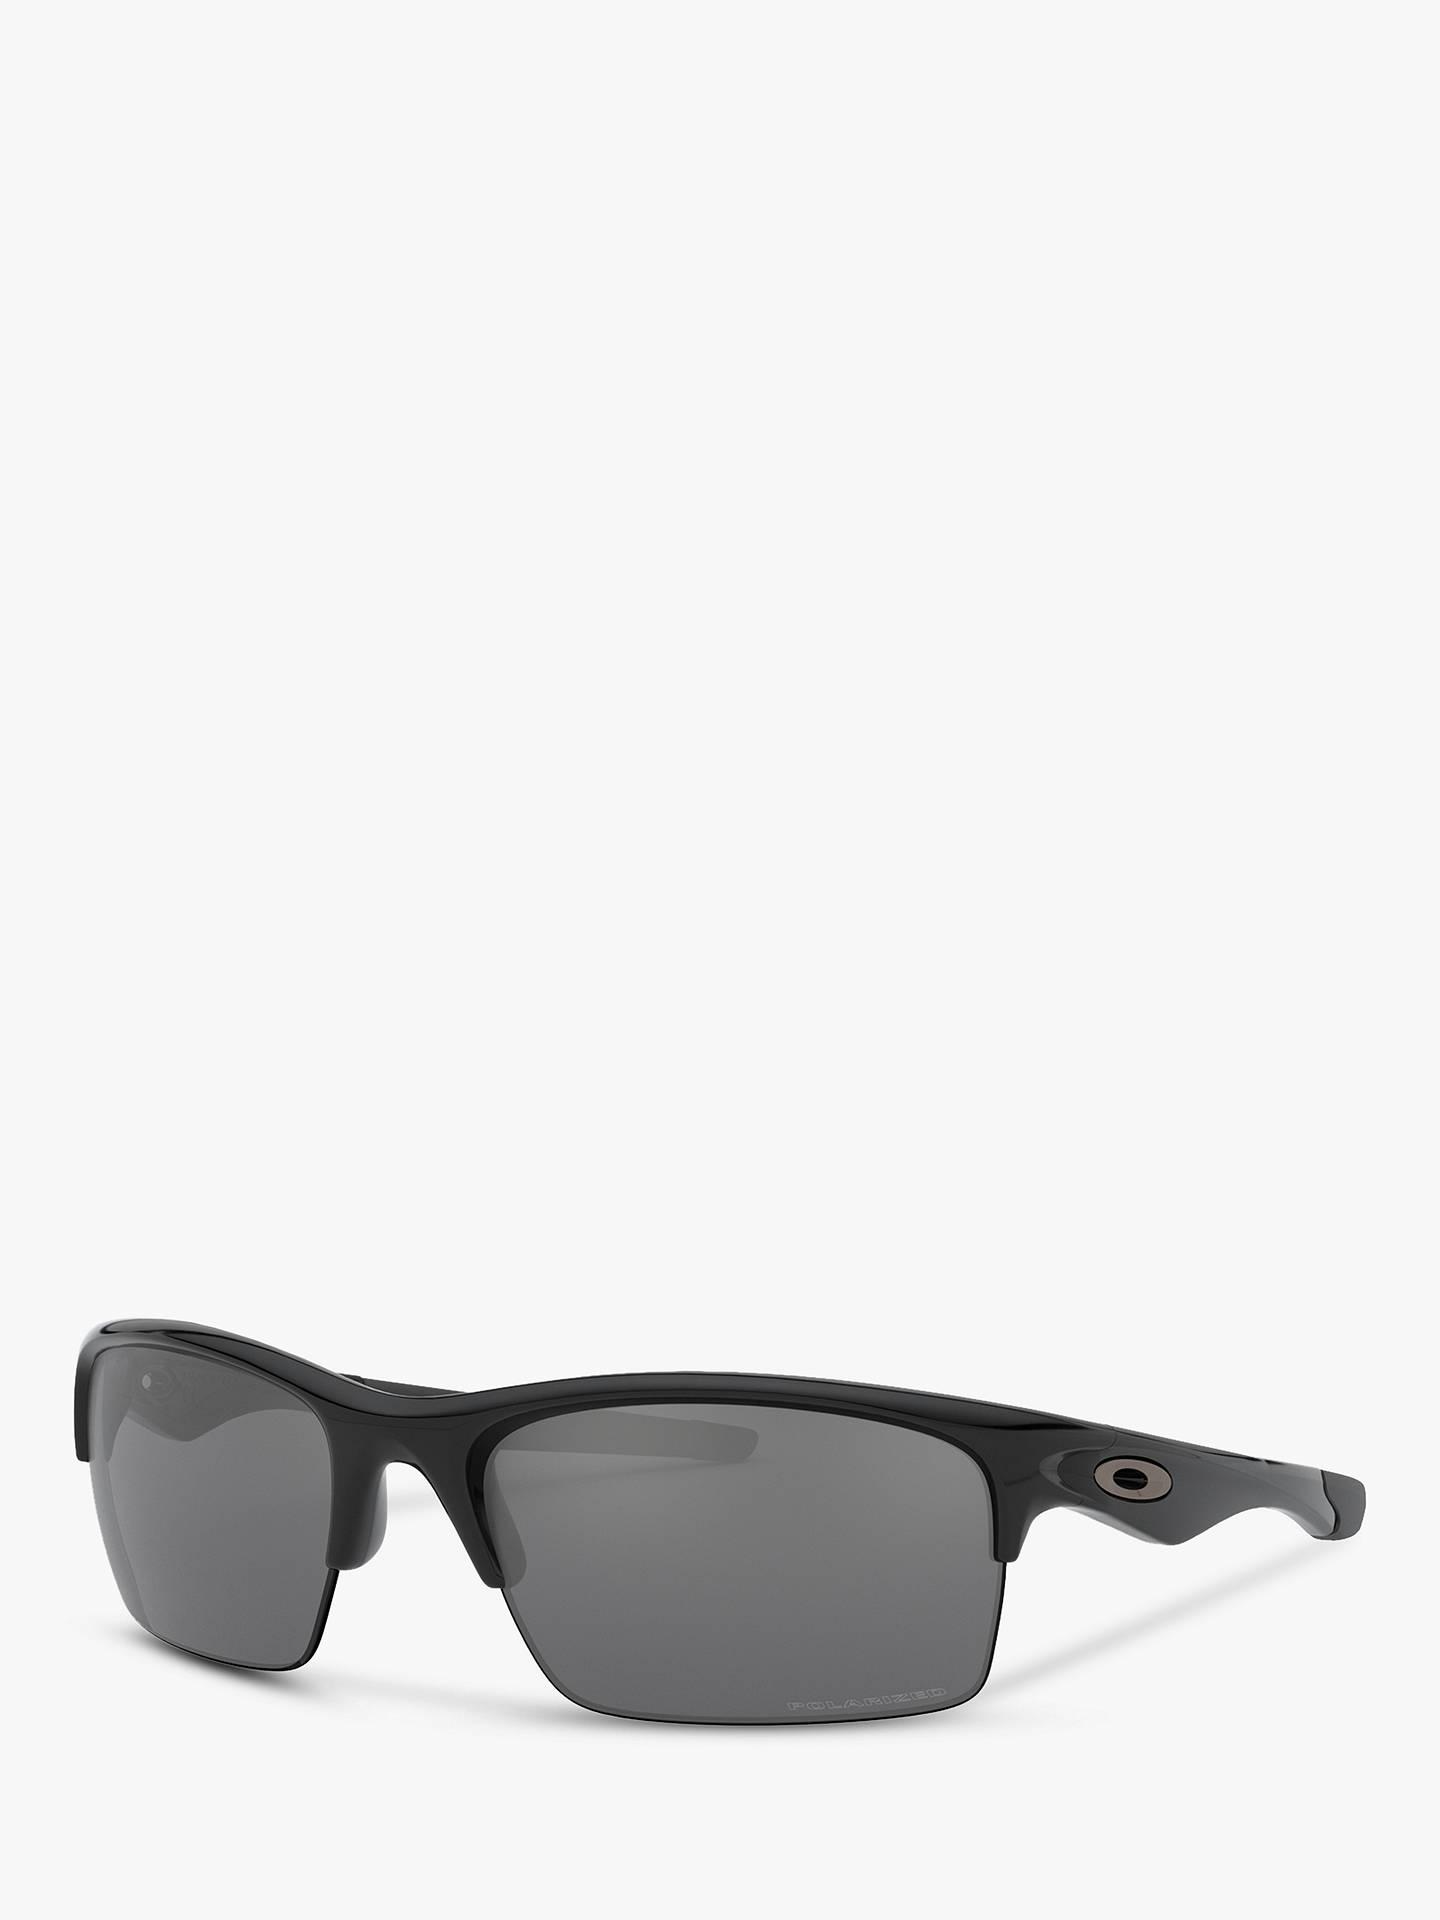 53b8d6b9be Oakley OO9164 Bottle Rocket Polarised Rectangular Sunglasses at John ...